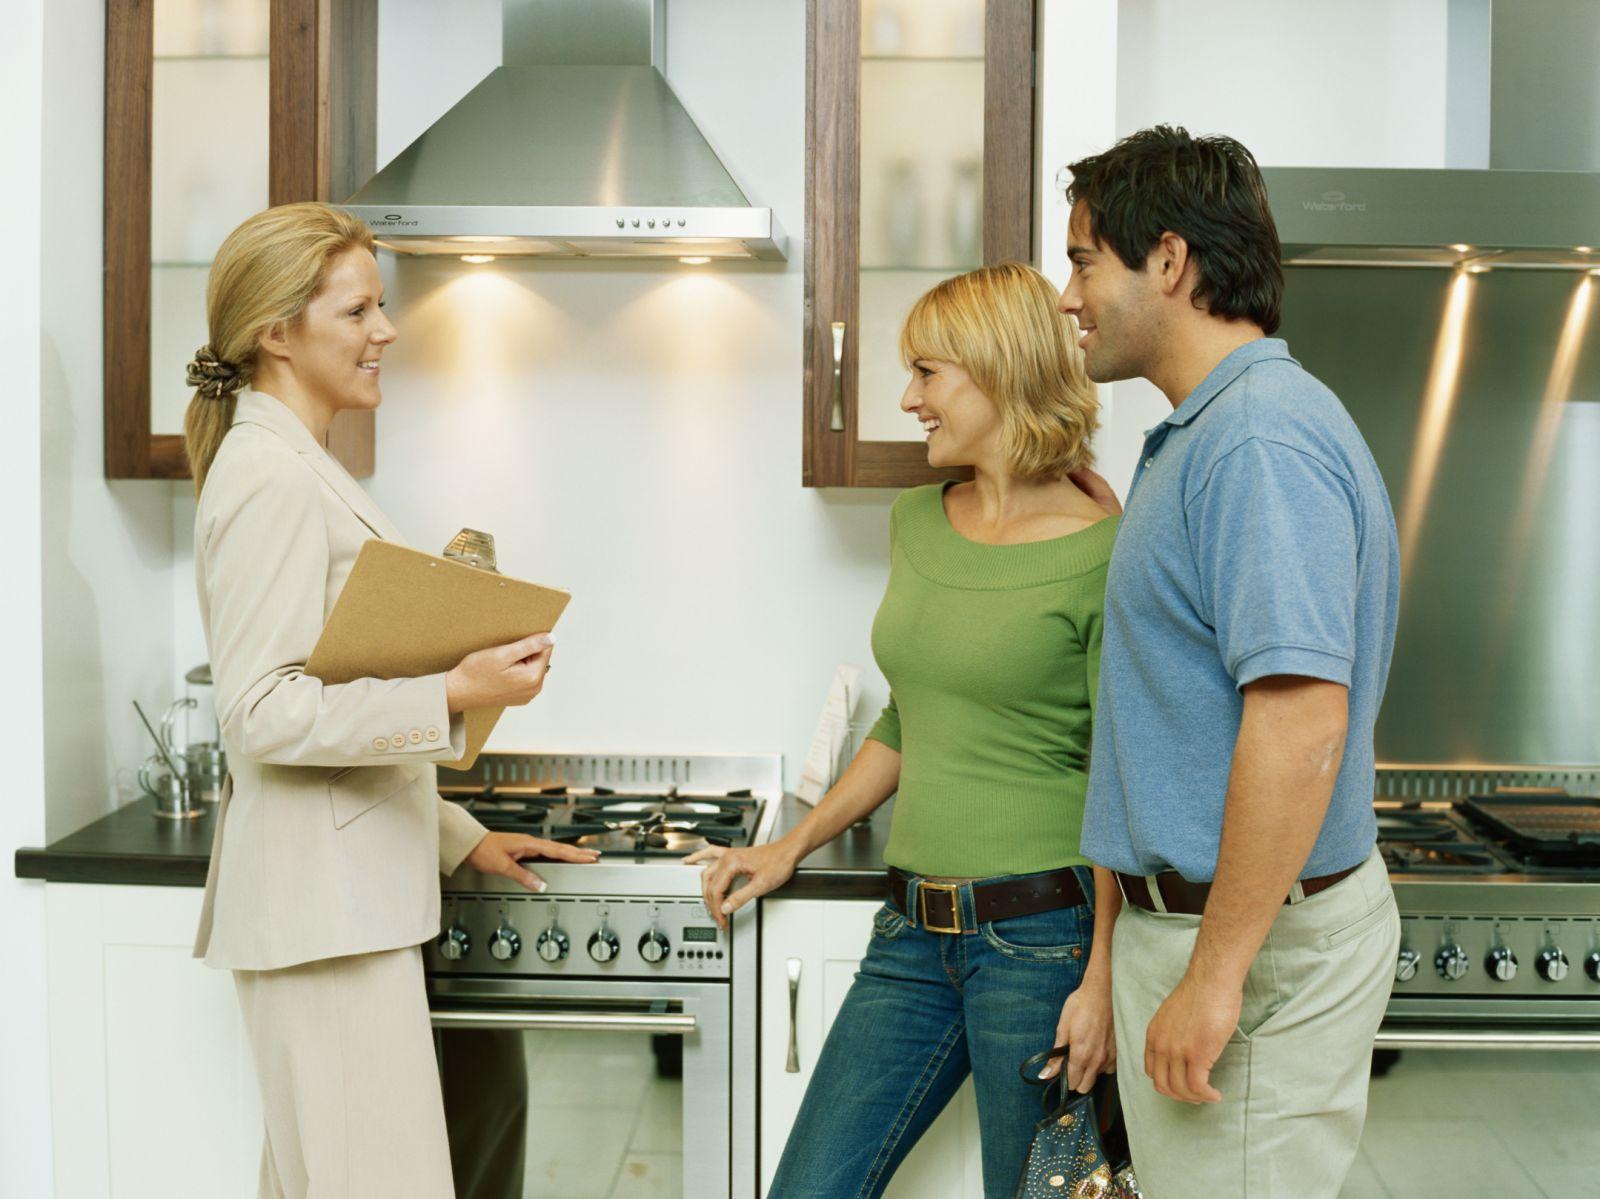 Преимущества покупки или продажи квартиры через агентство (1 фото)